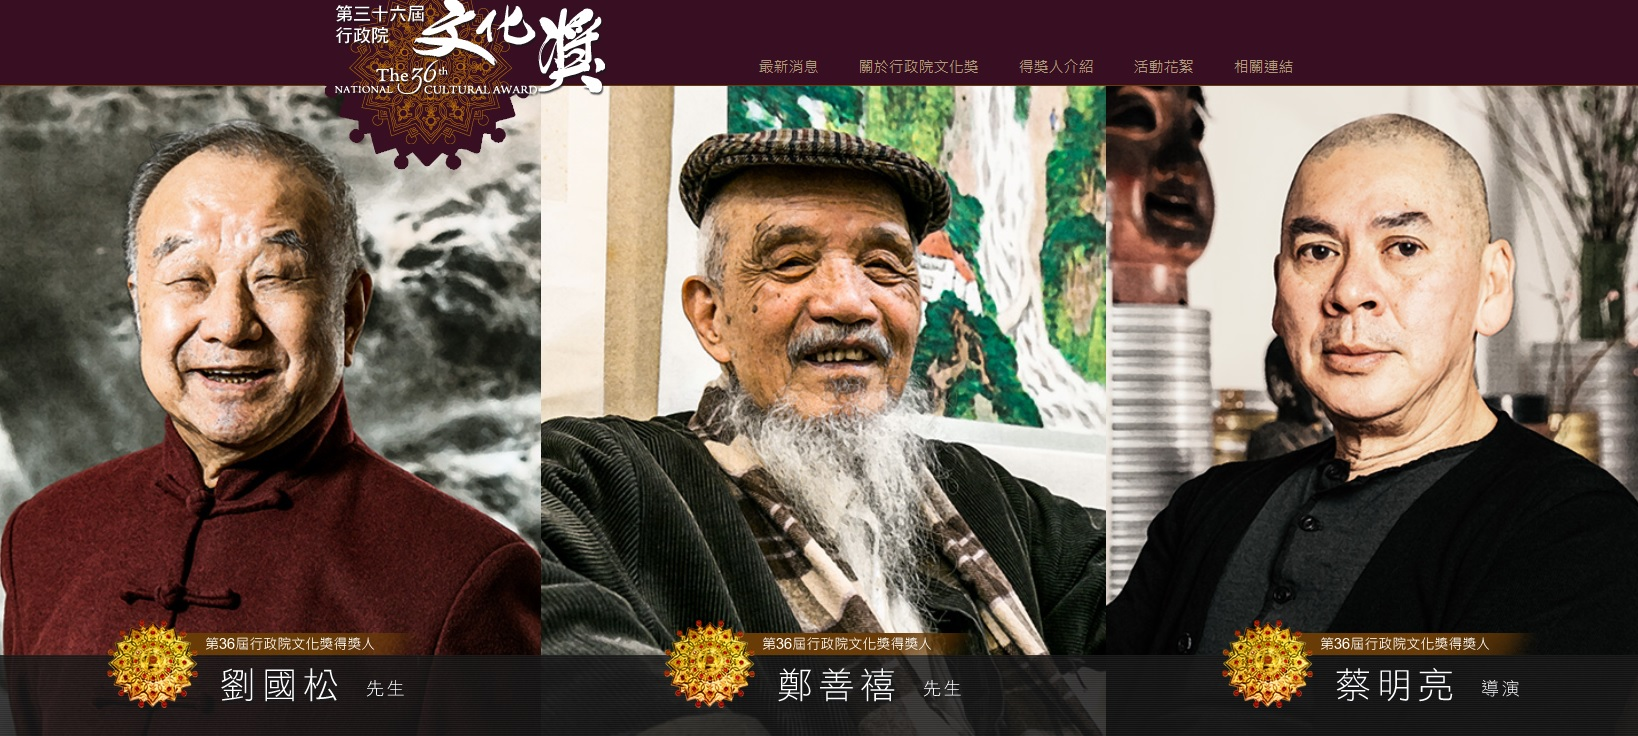 National Cultural Award